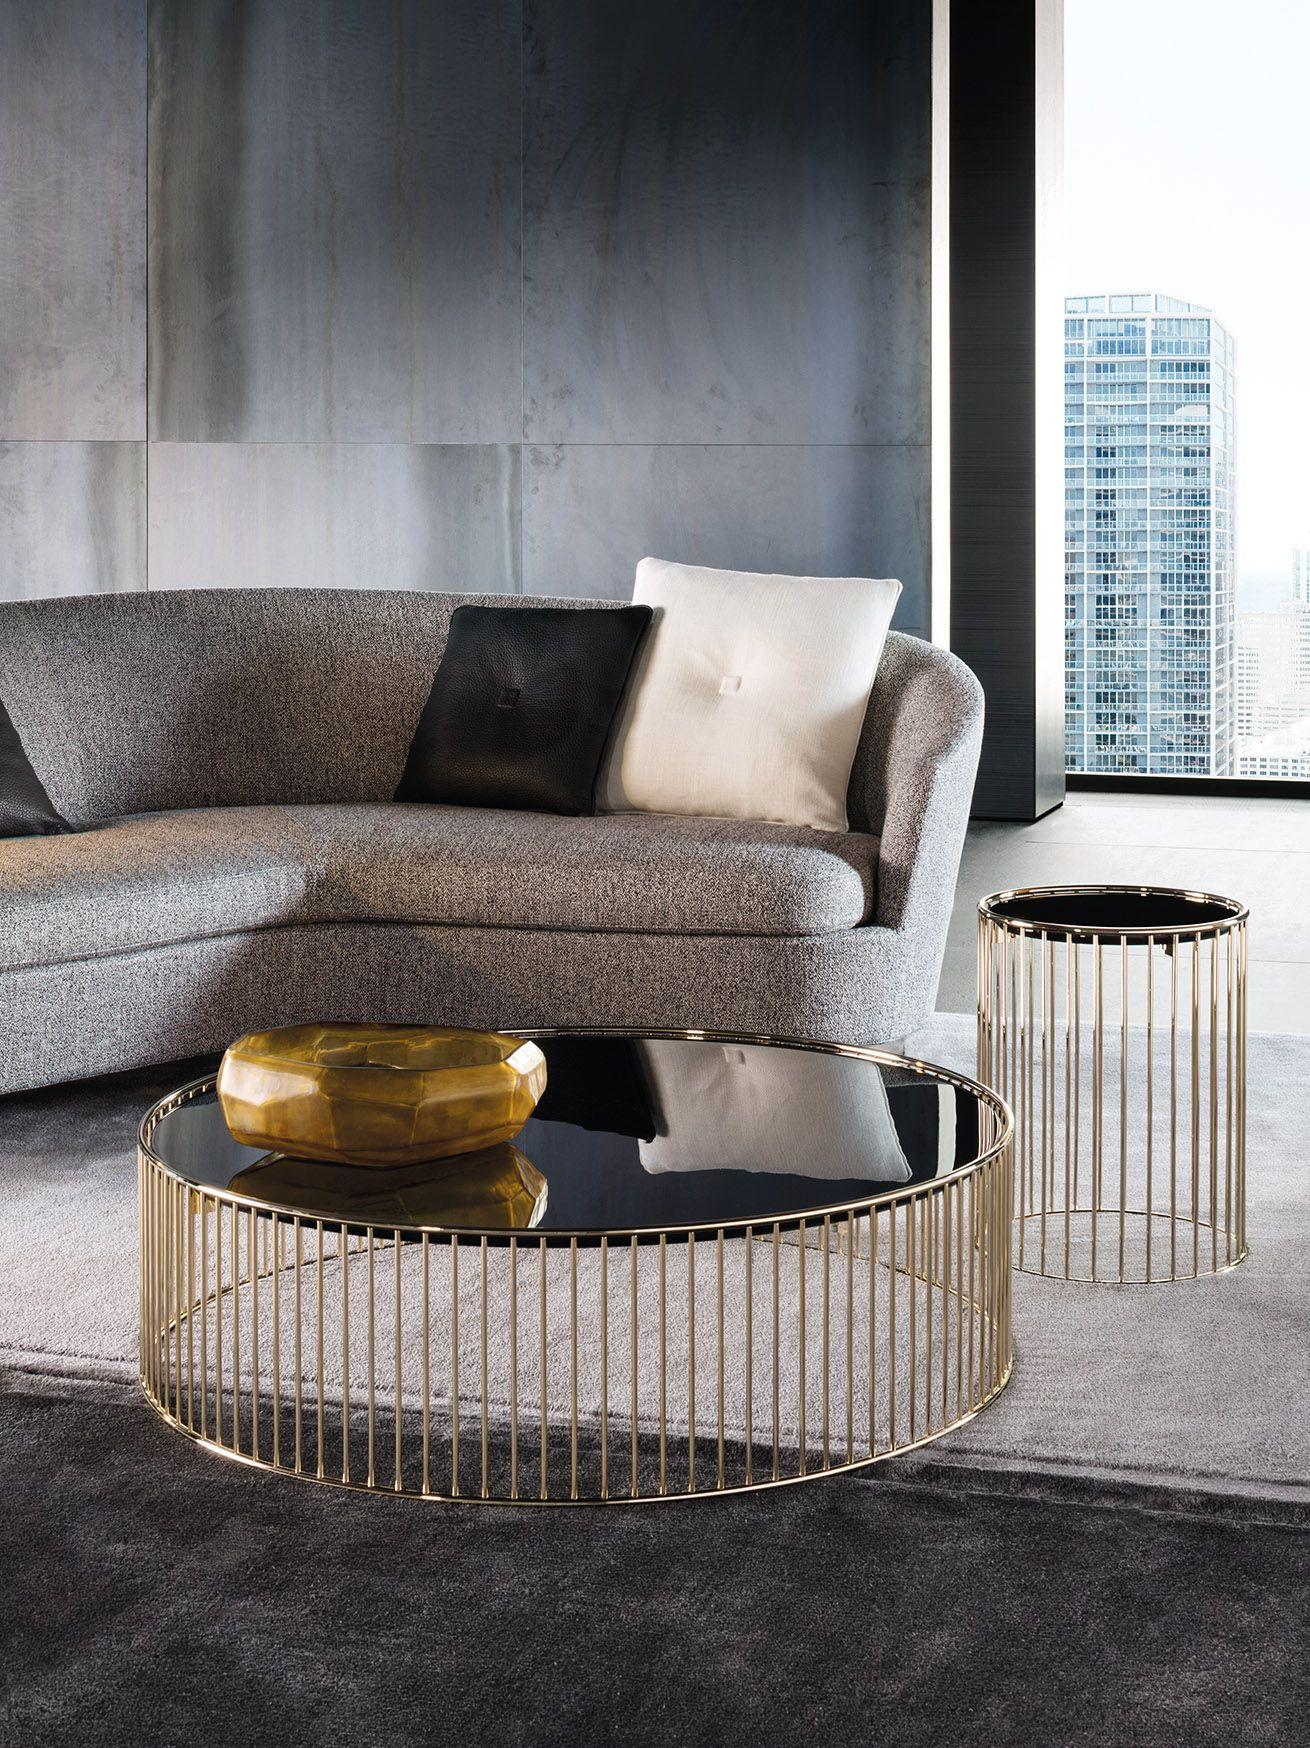 Caulfield coffee table by Rodolfo Dordoni for Minotti | deco idea ...